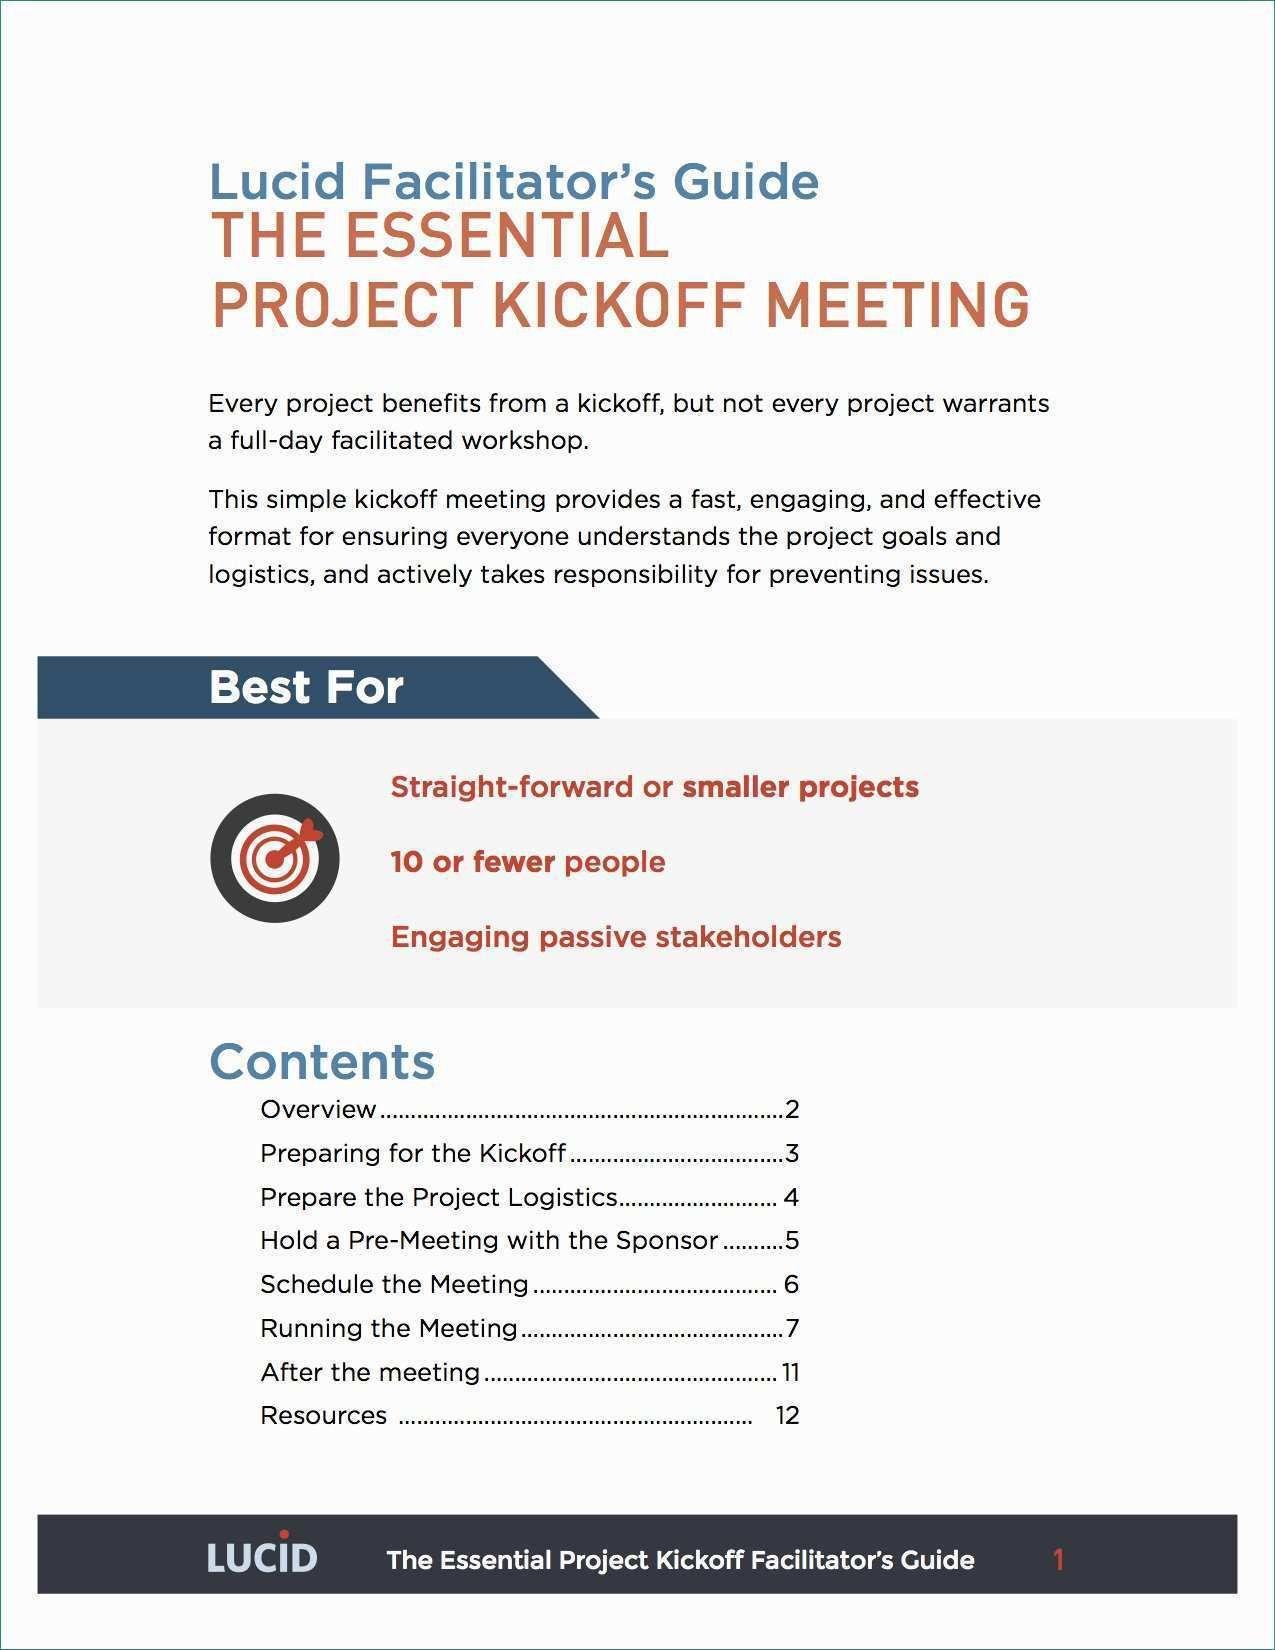 000 Unusual Project Kickoff Meeting Agenda Example Photo  Management TemplateFull